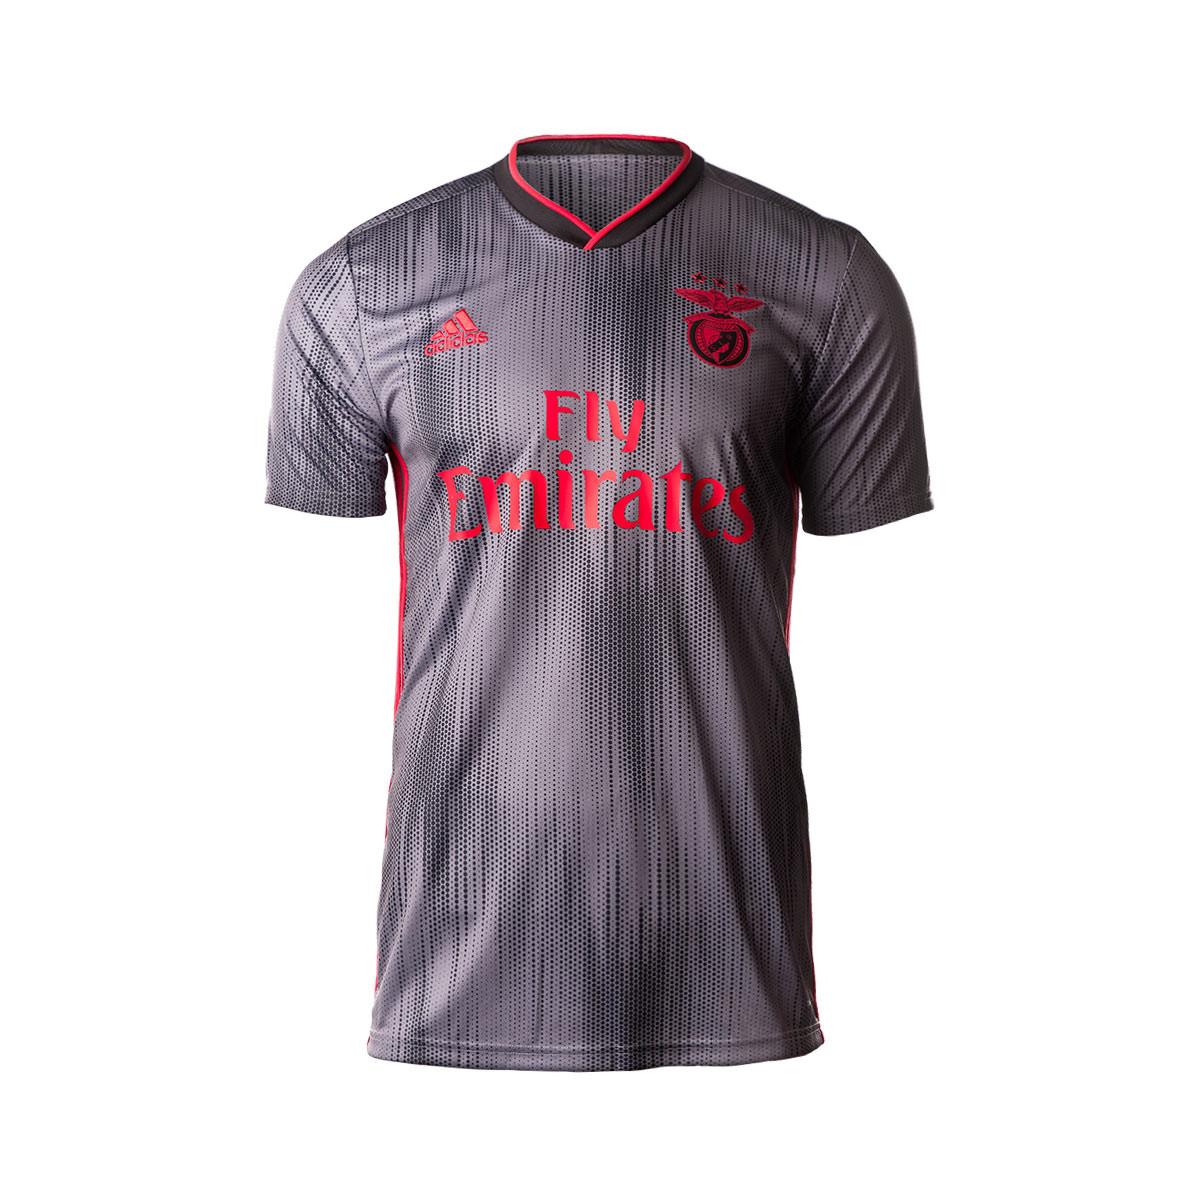 the best attitude 71f58 7929f Camiseta Benfica SL Segunda Equipación 2019-2020 Black-Grey